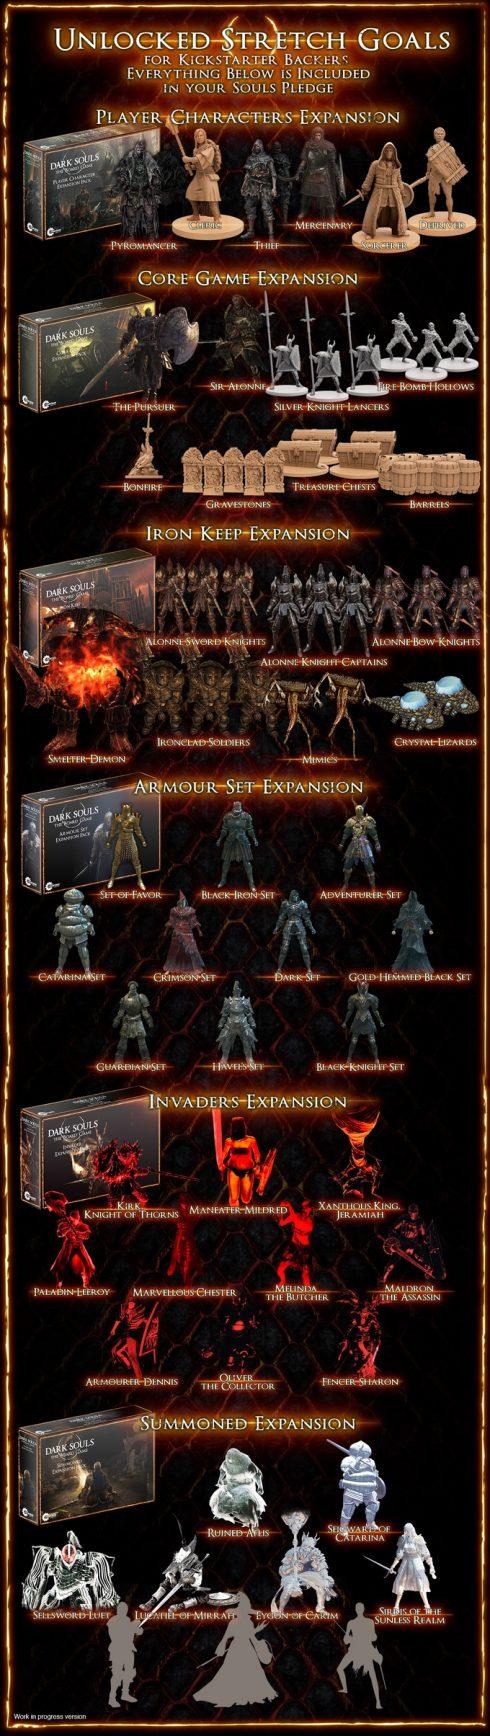 Dark souls the board game kickstarter kampagne neigt sich dem ende zu - Gioco da tavolo dark souls ...